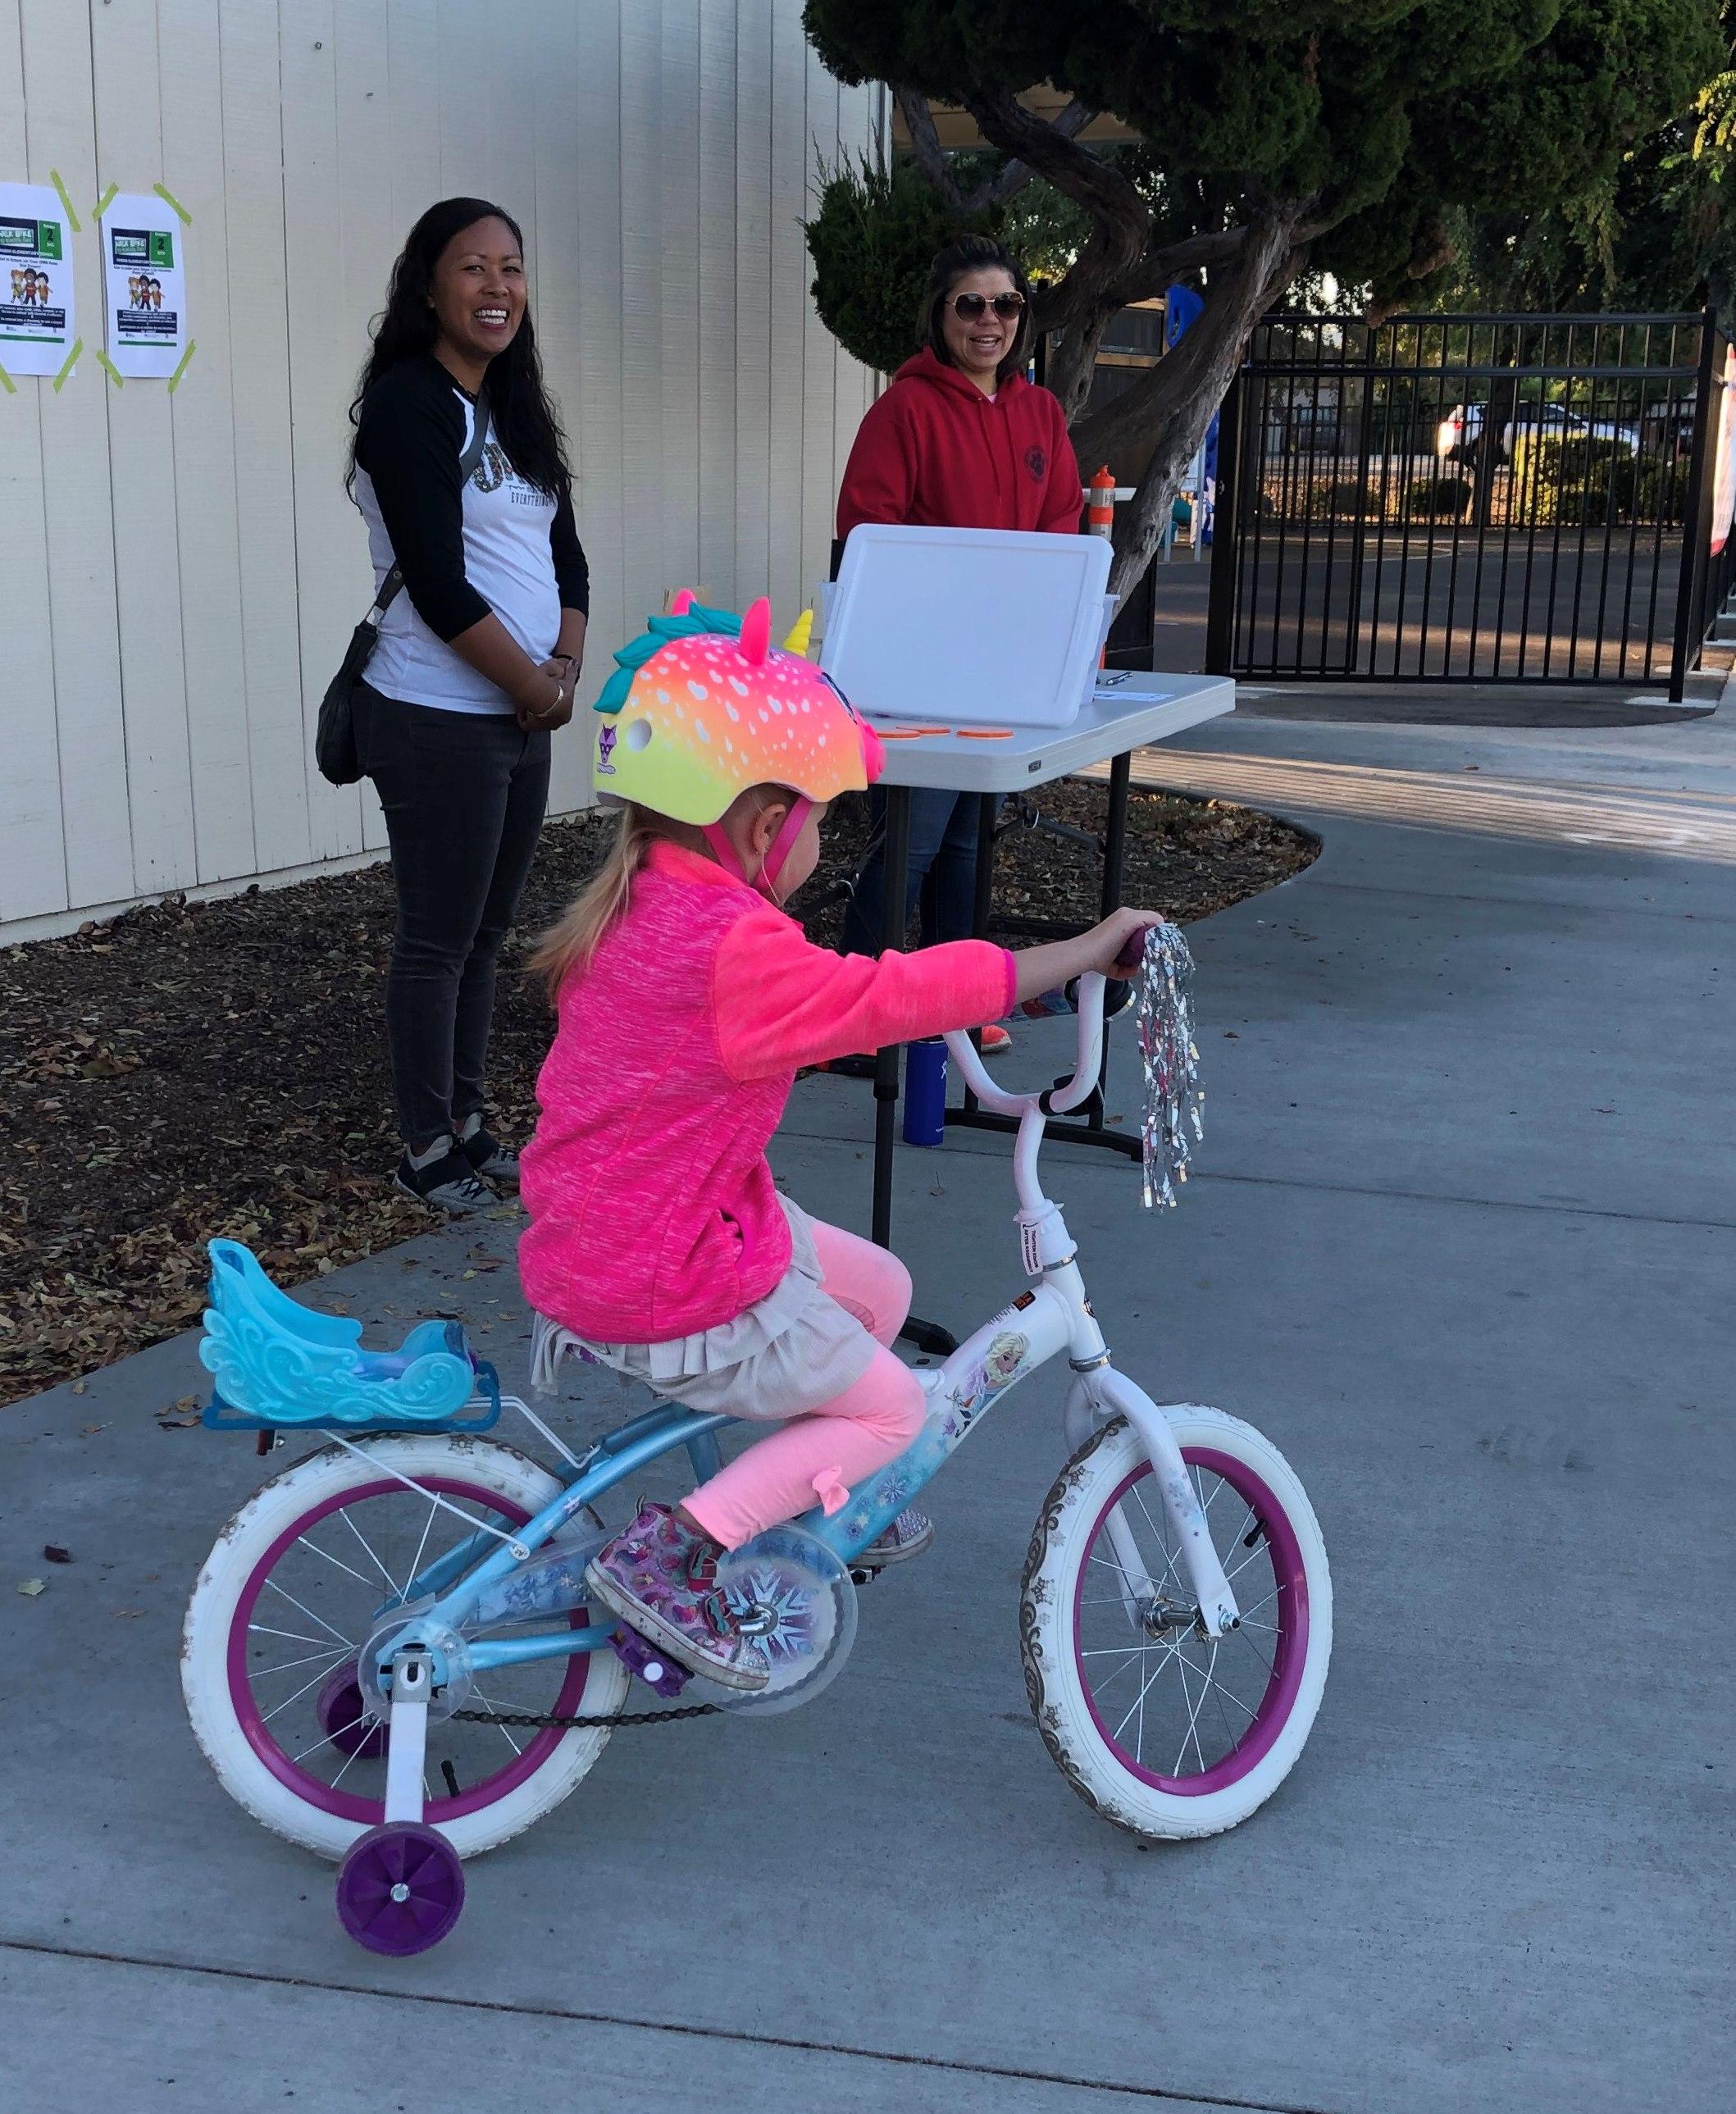 Student on bike wearing helmet